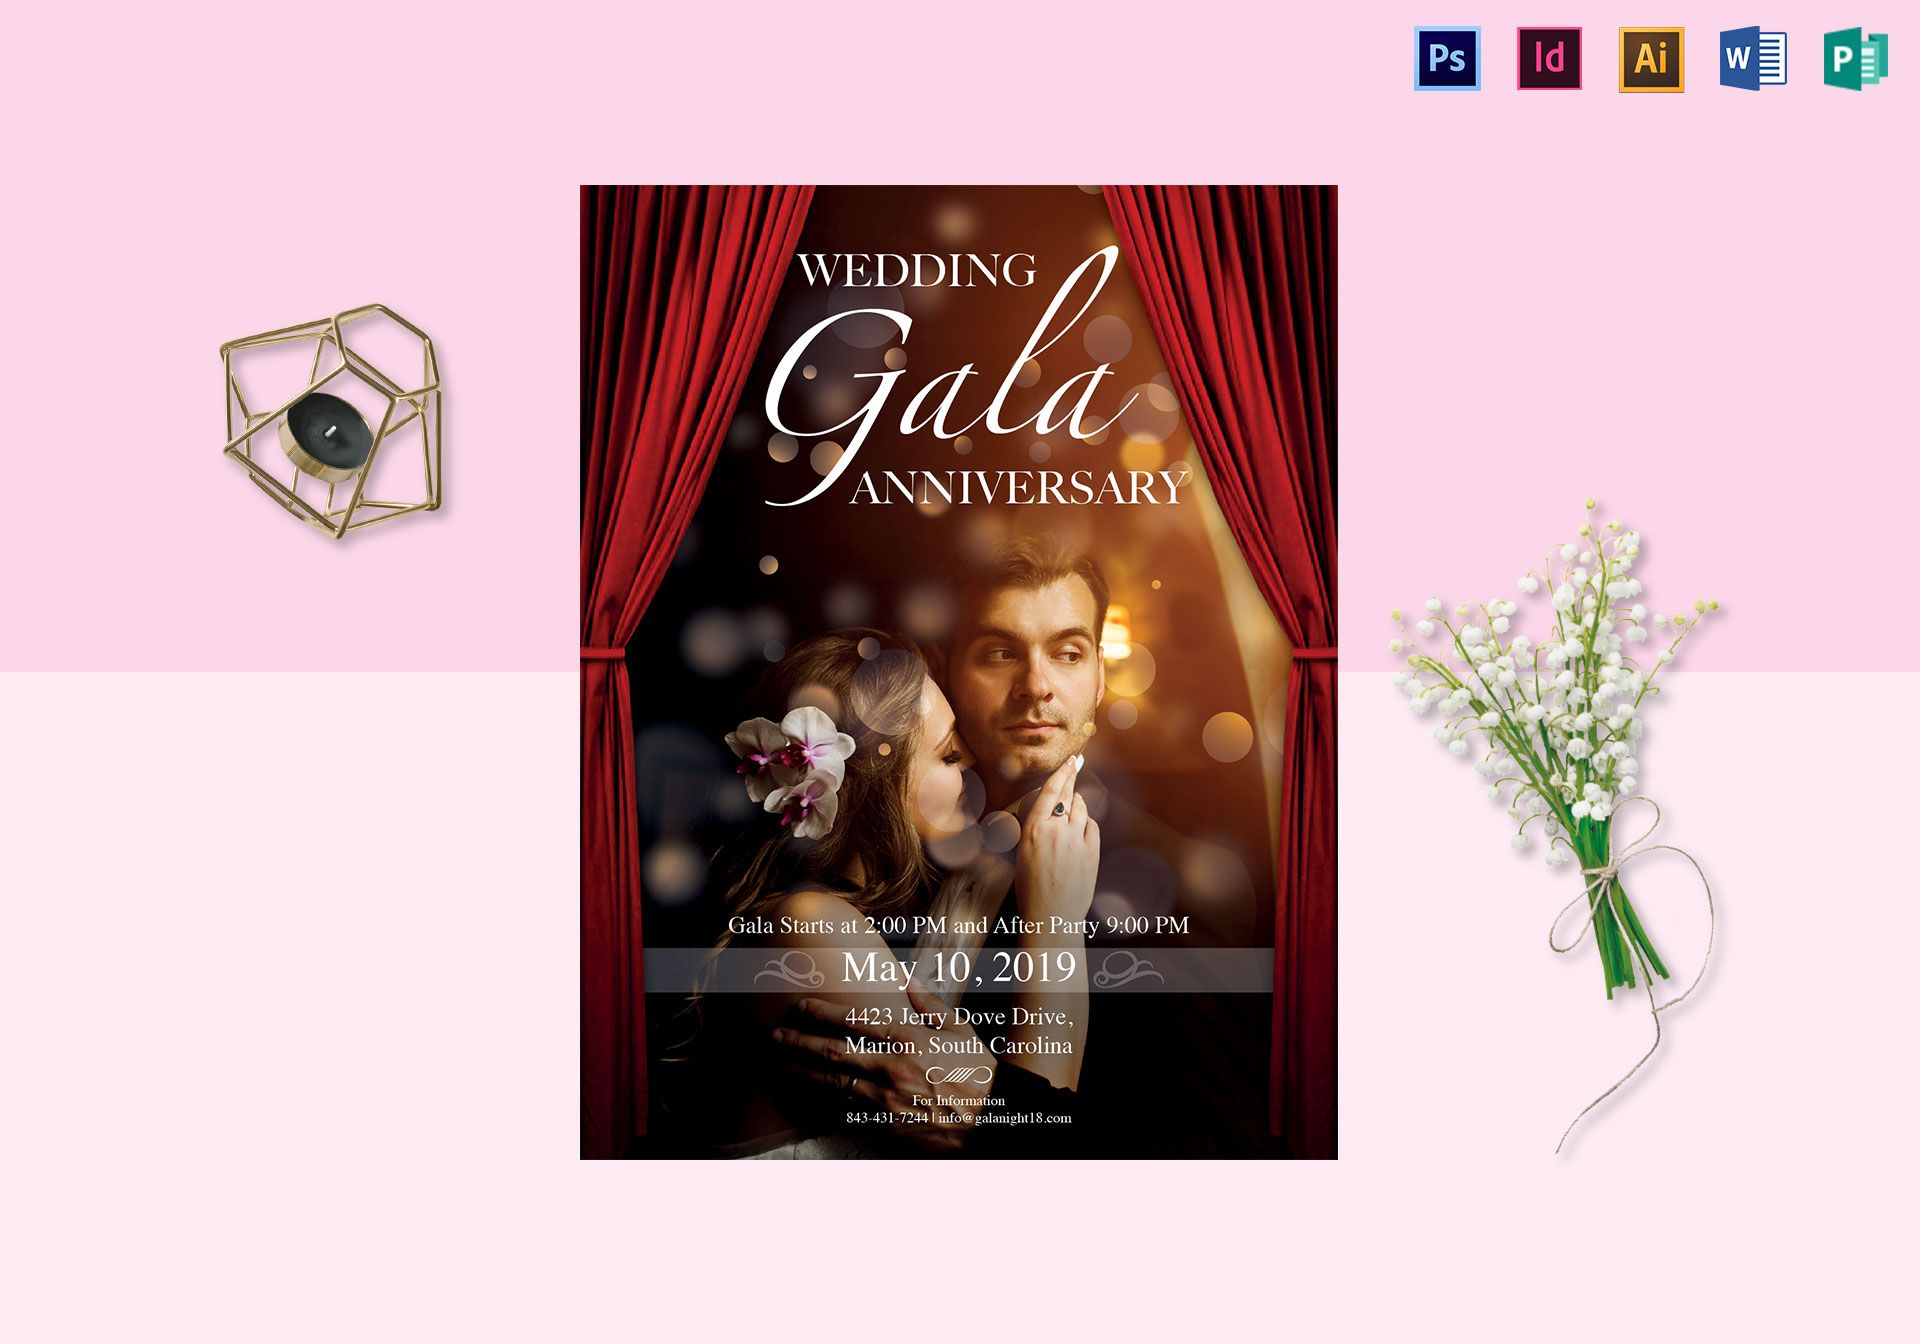 Wedding Gala Anniversary Flyer